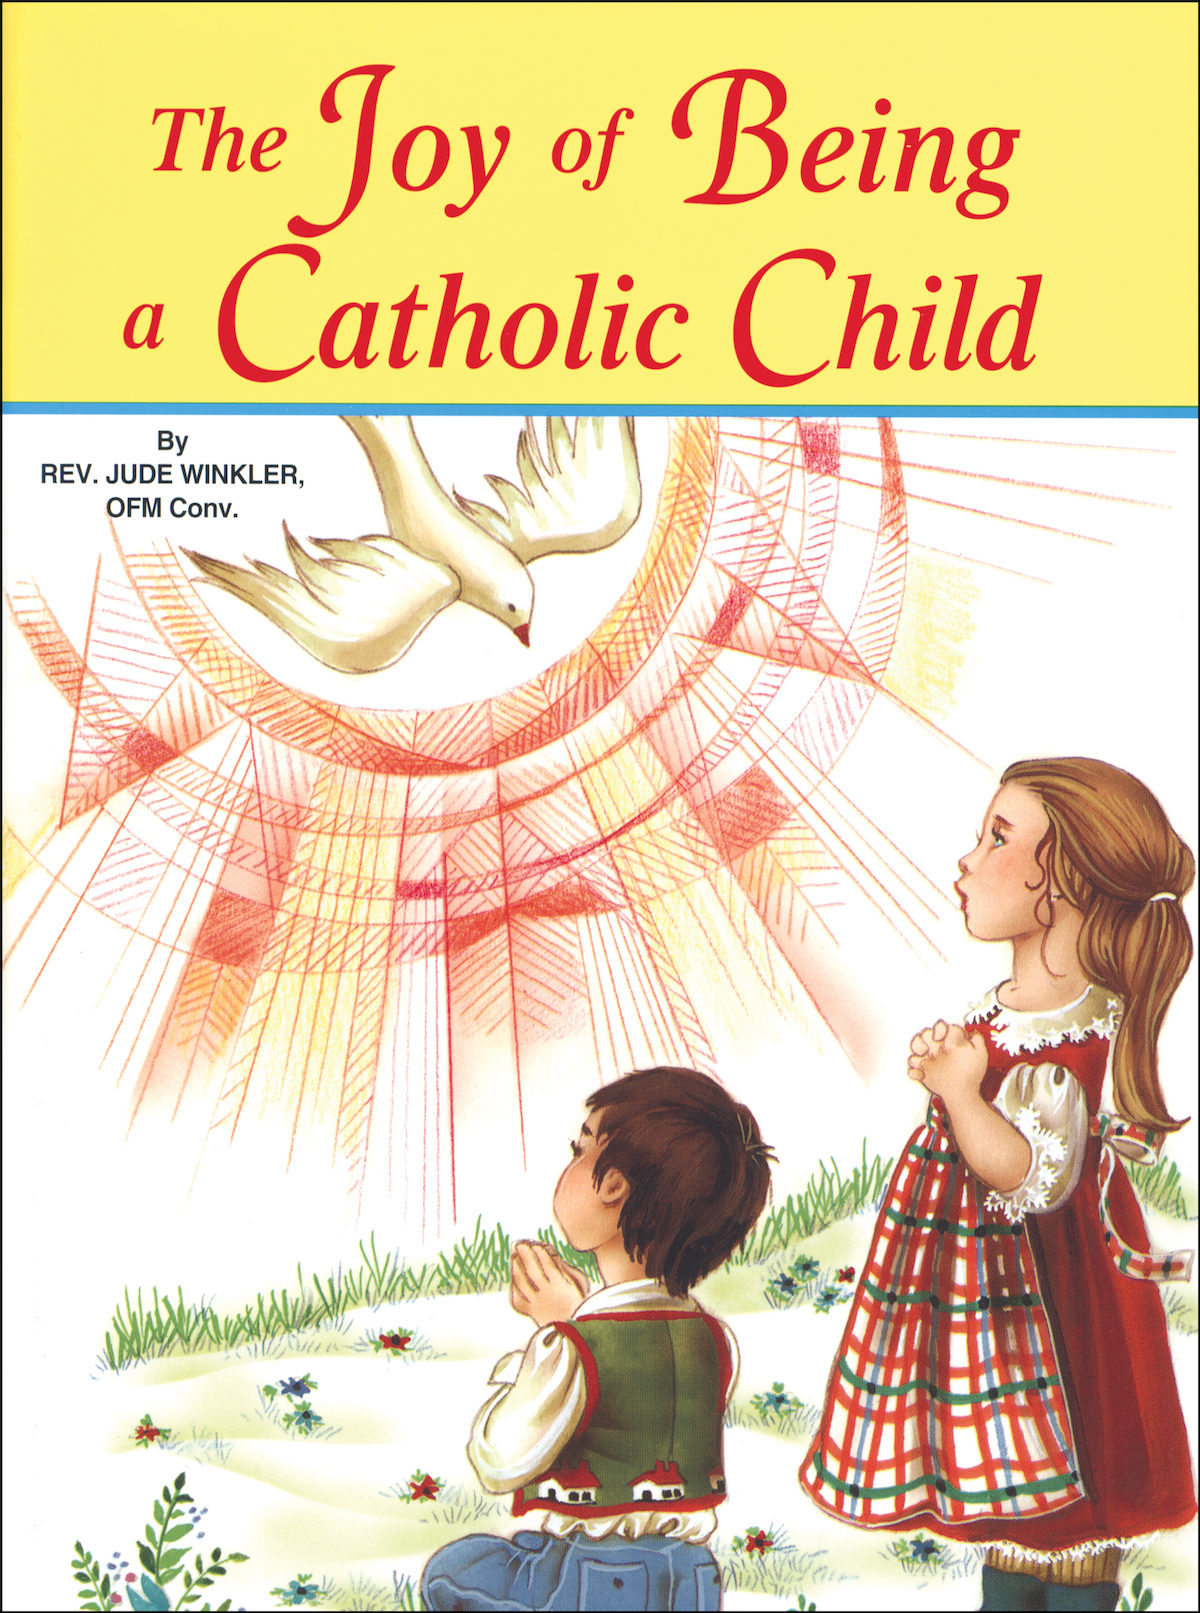 St. Joseph Picture Books: The Joy of Being a Catholic Child | ComCenter.com - Catholic Religious Education